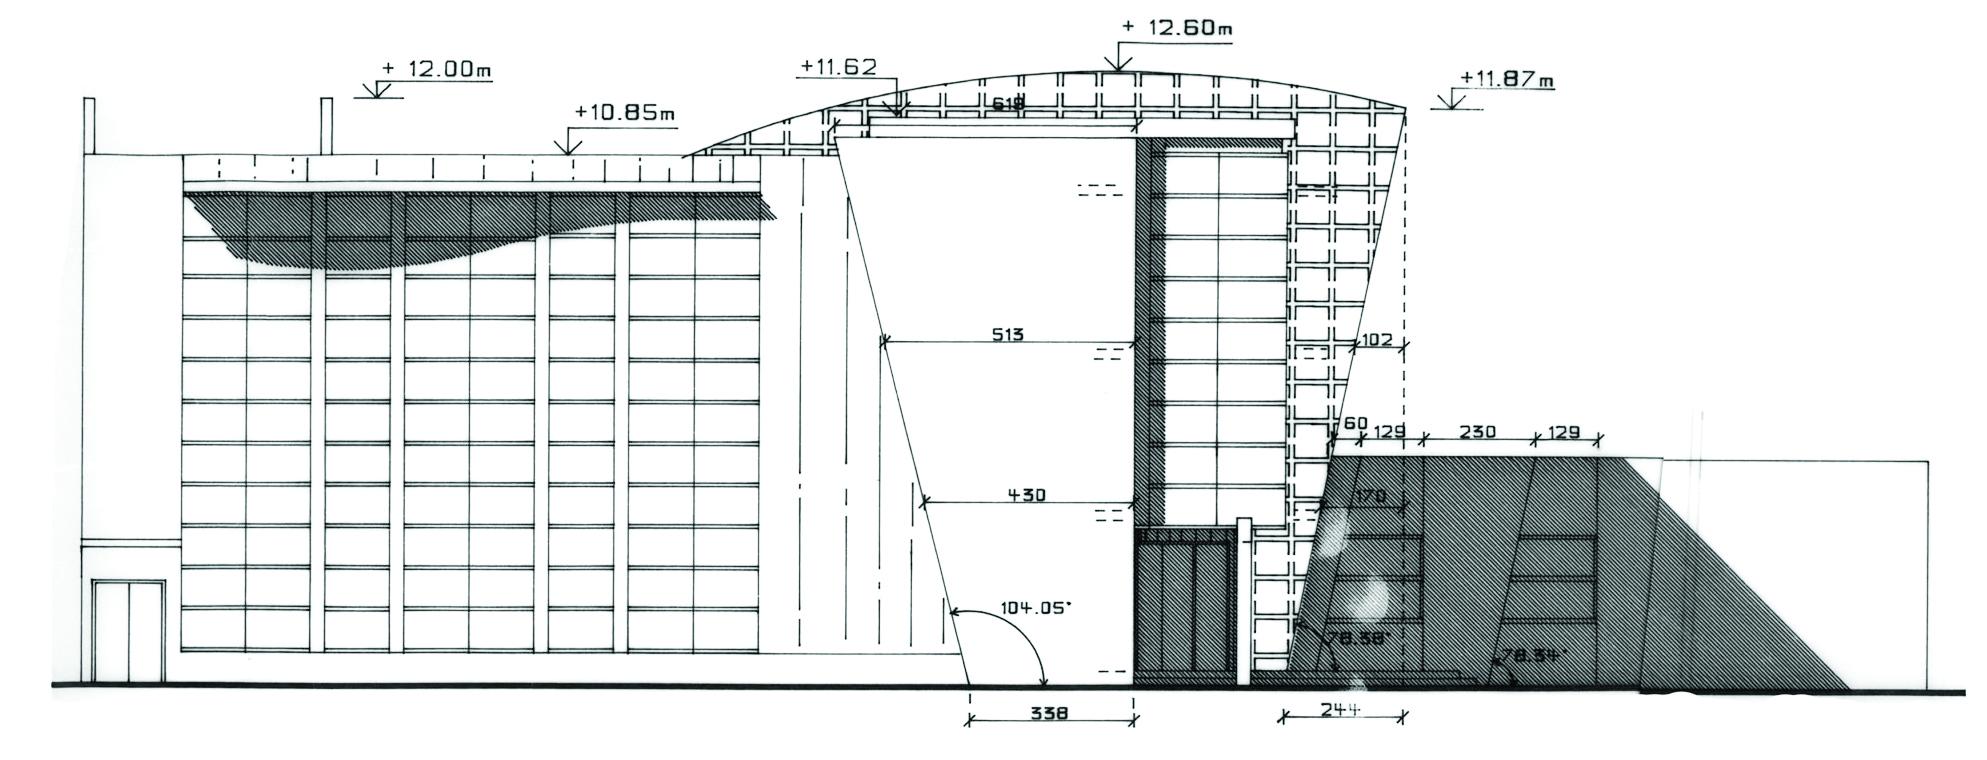 Plan Fiat1